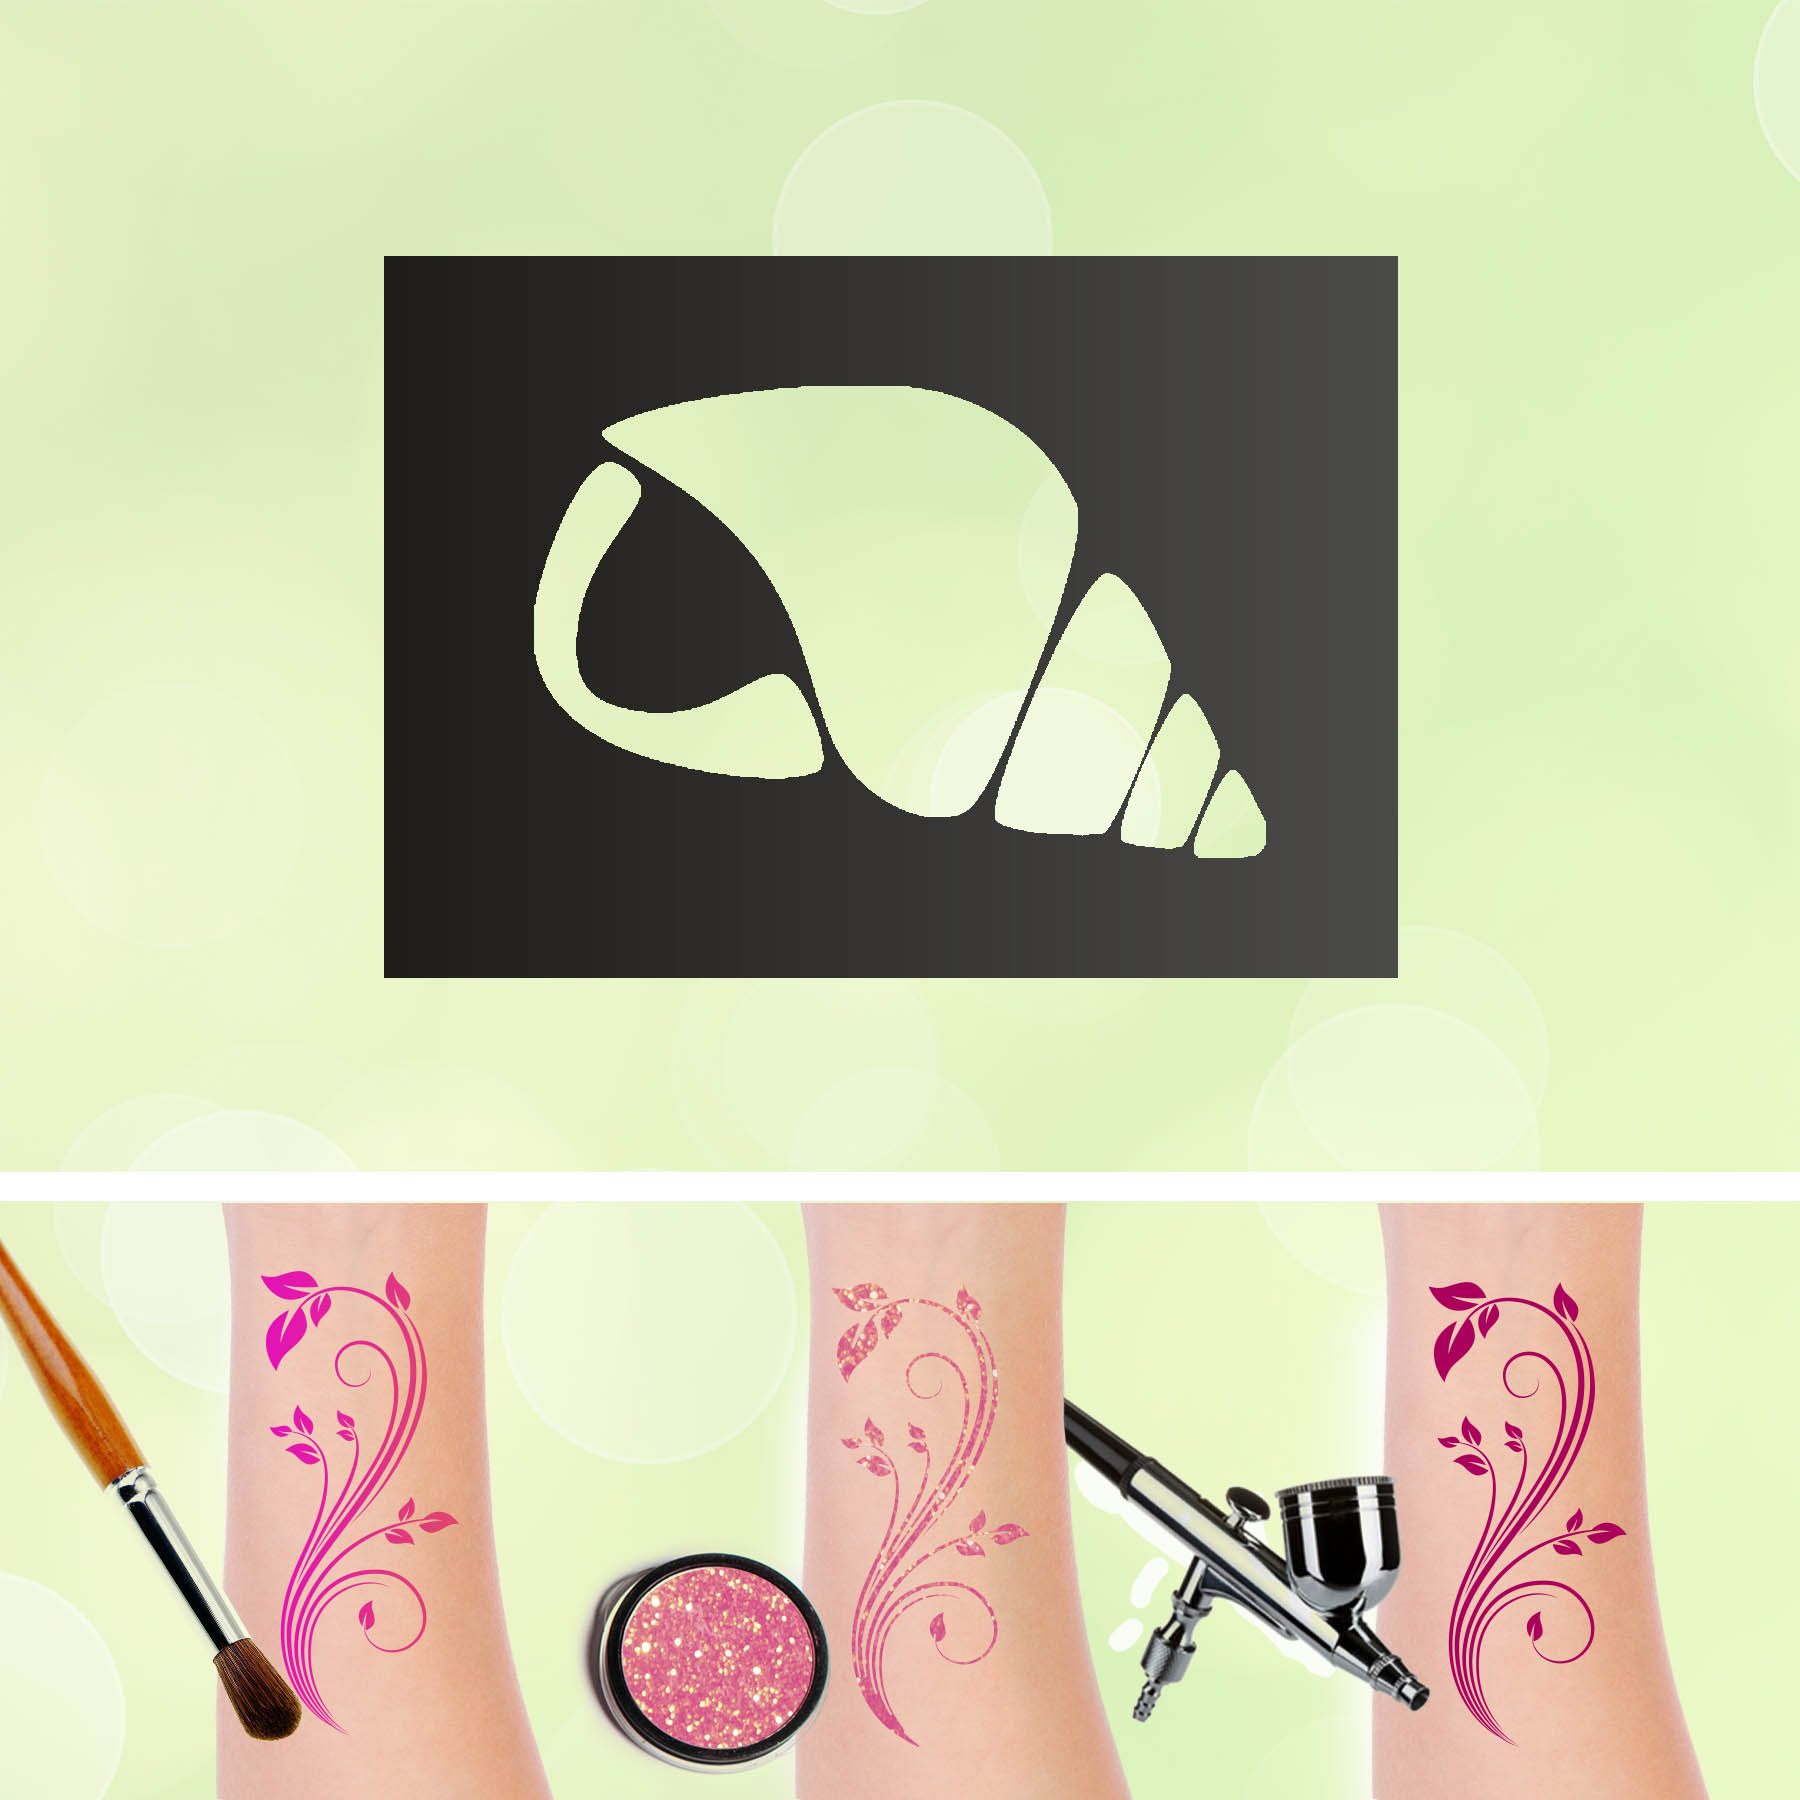 Tattoo Schablonen Muschel Selbstklebend Kinderschminken Airbrush